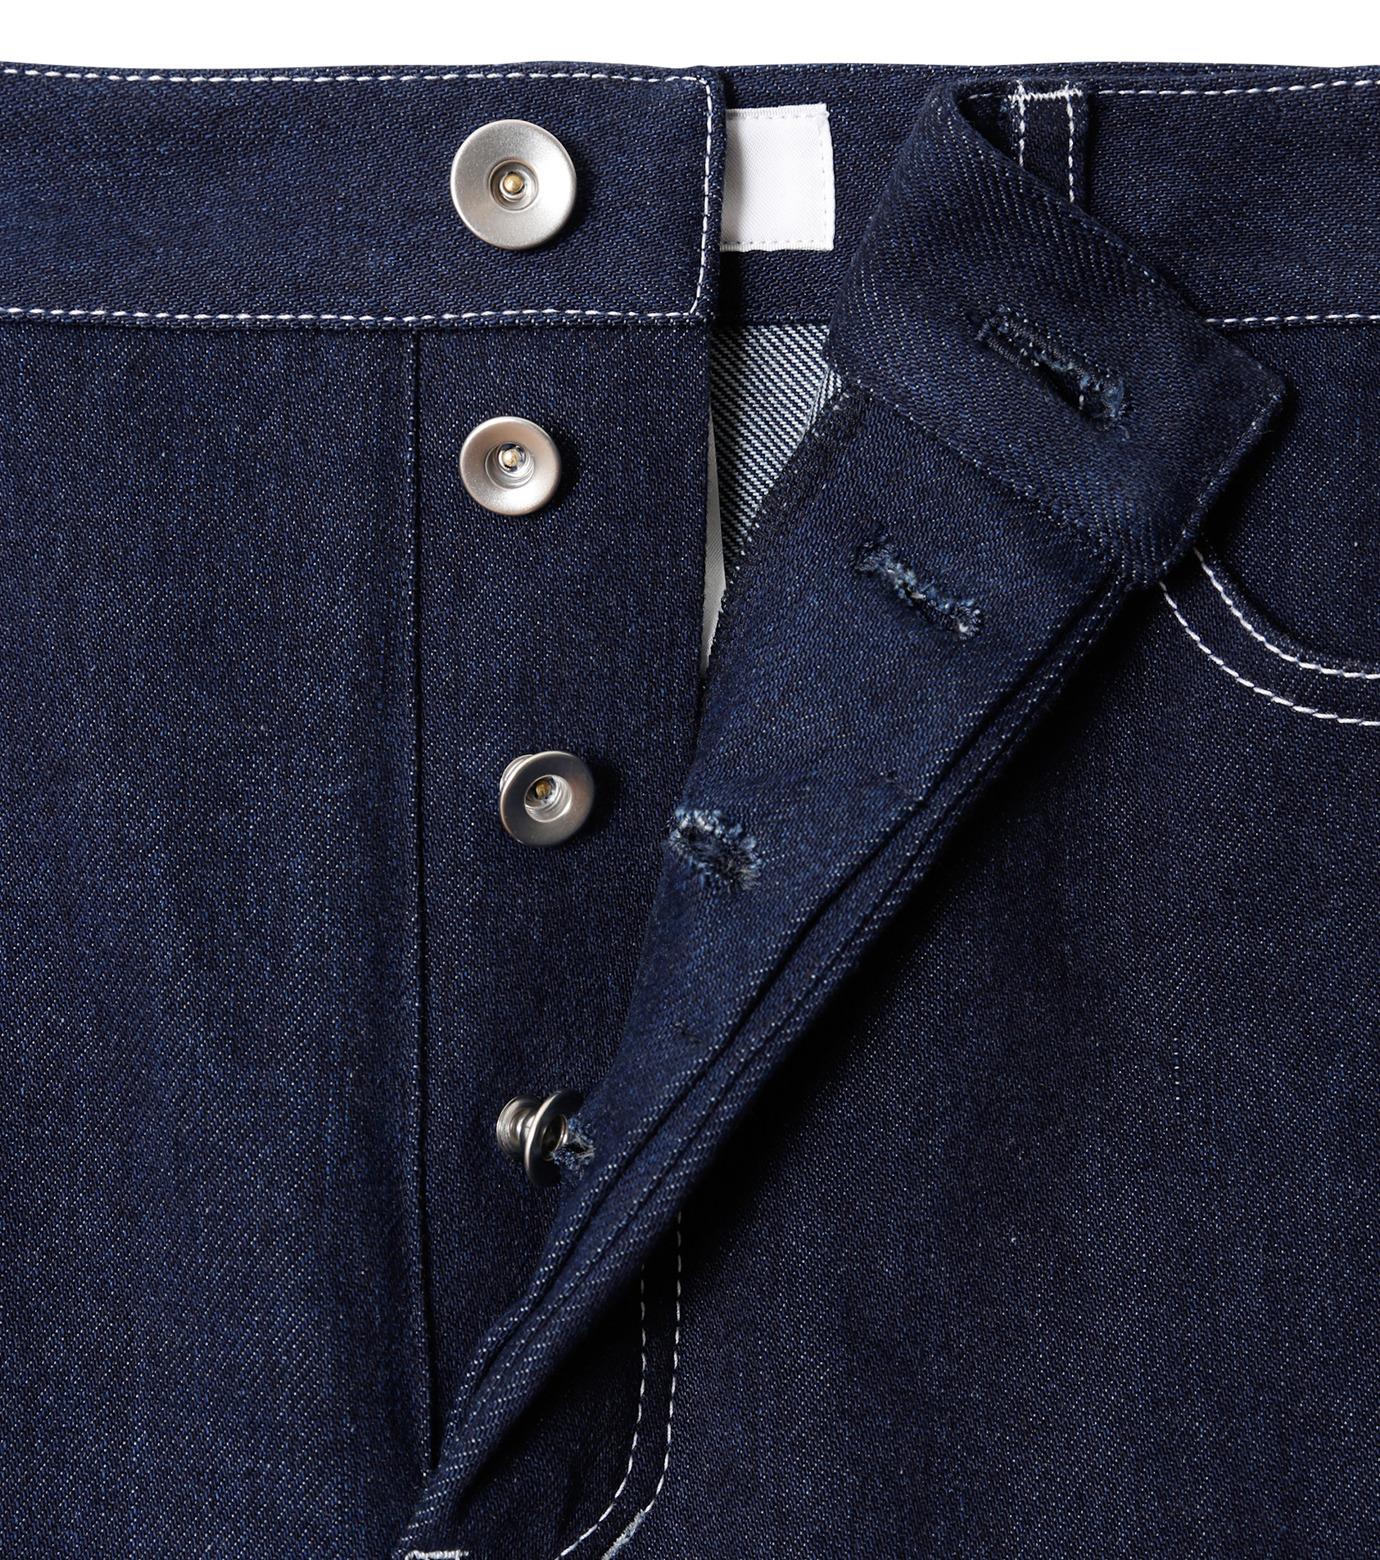 LE CIEL BLEU(ルシェルブルー)のデニムフォールドバックパンツ-INDIGO(パンツ/pants)-18A68304 拡大詳細画像5